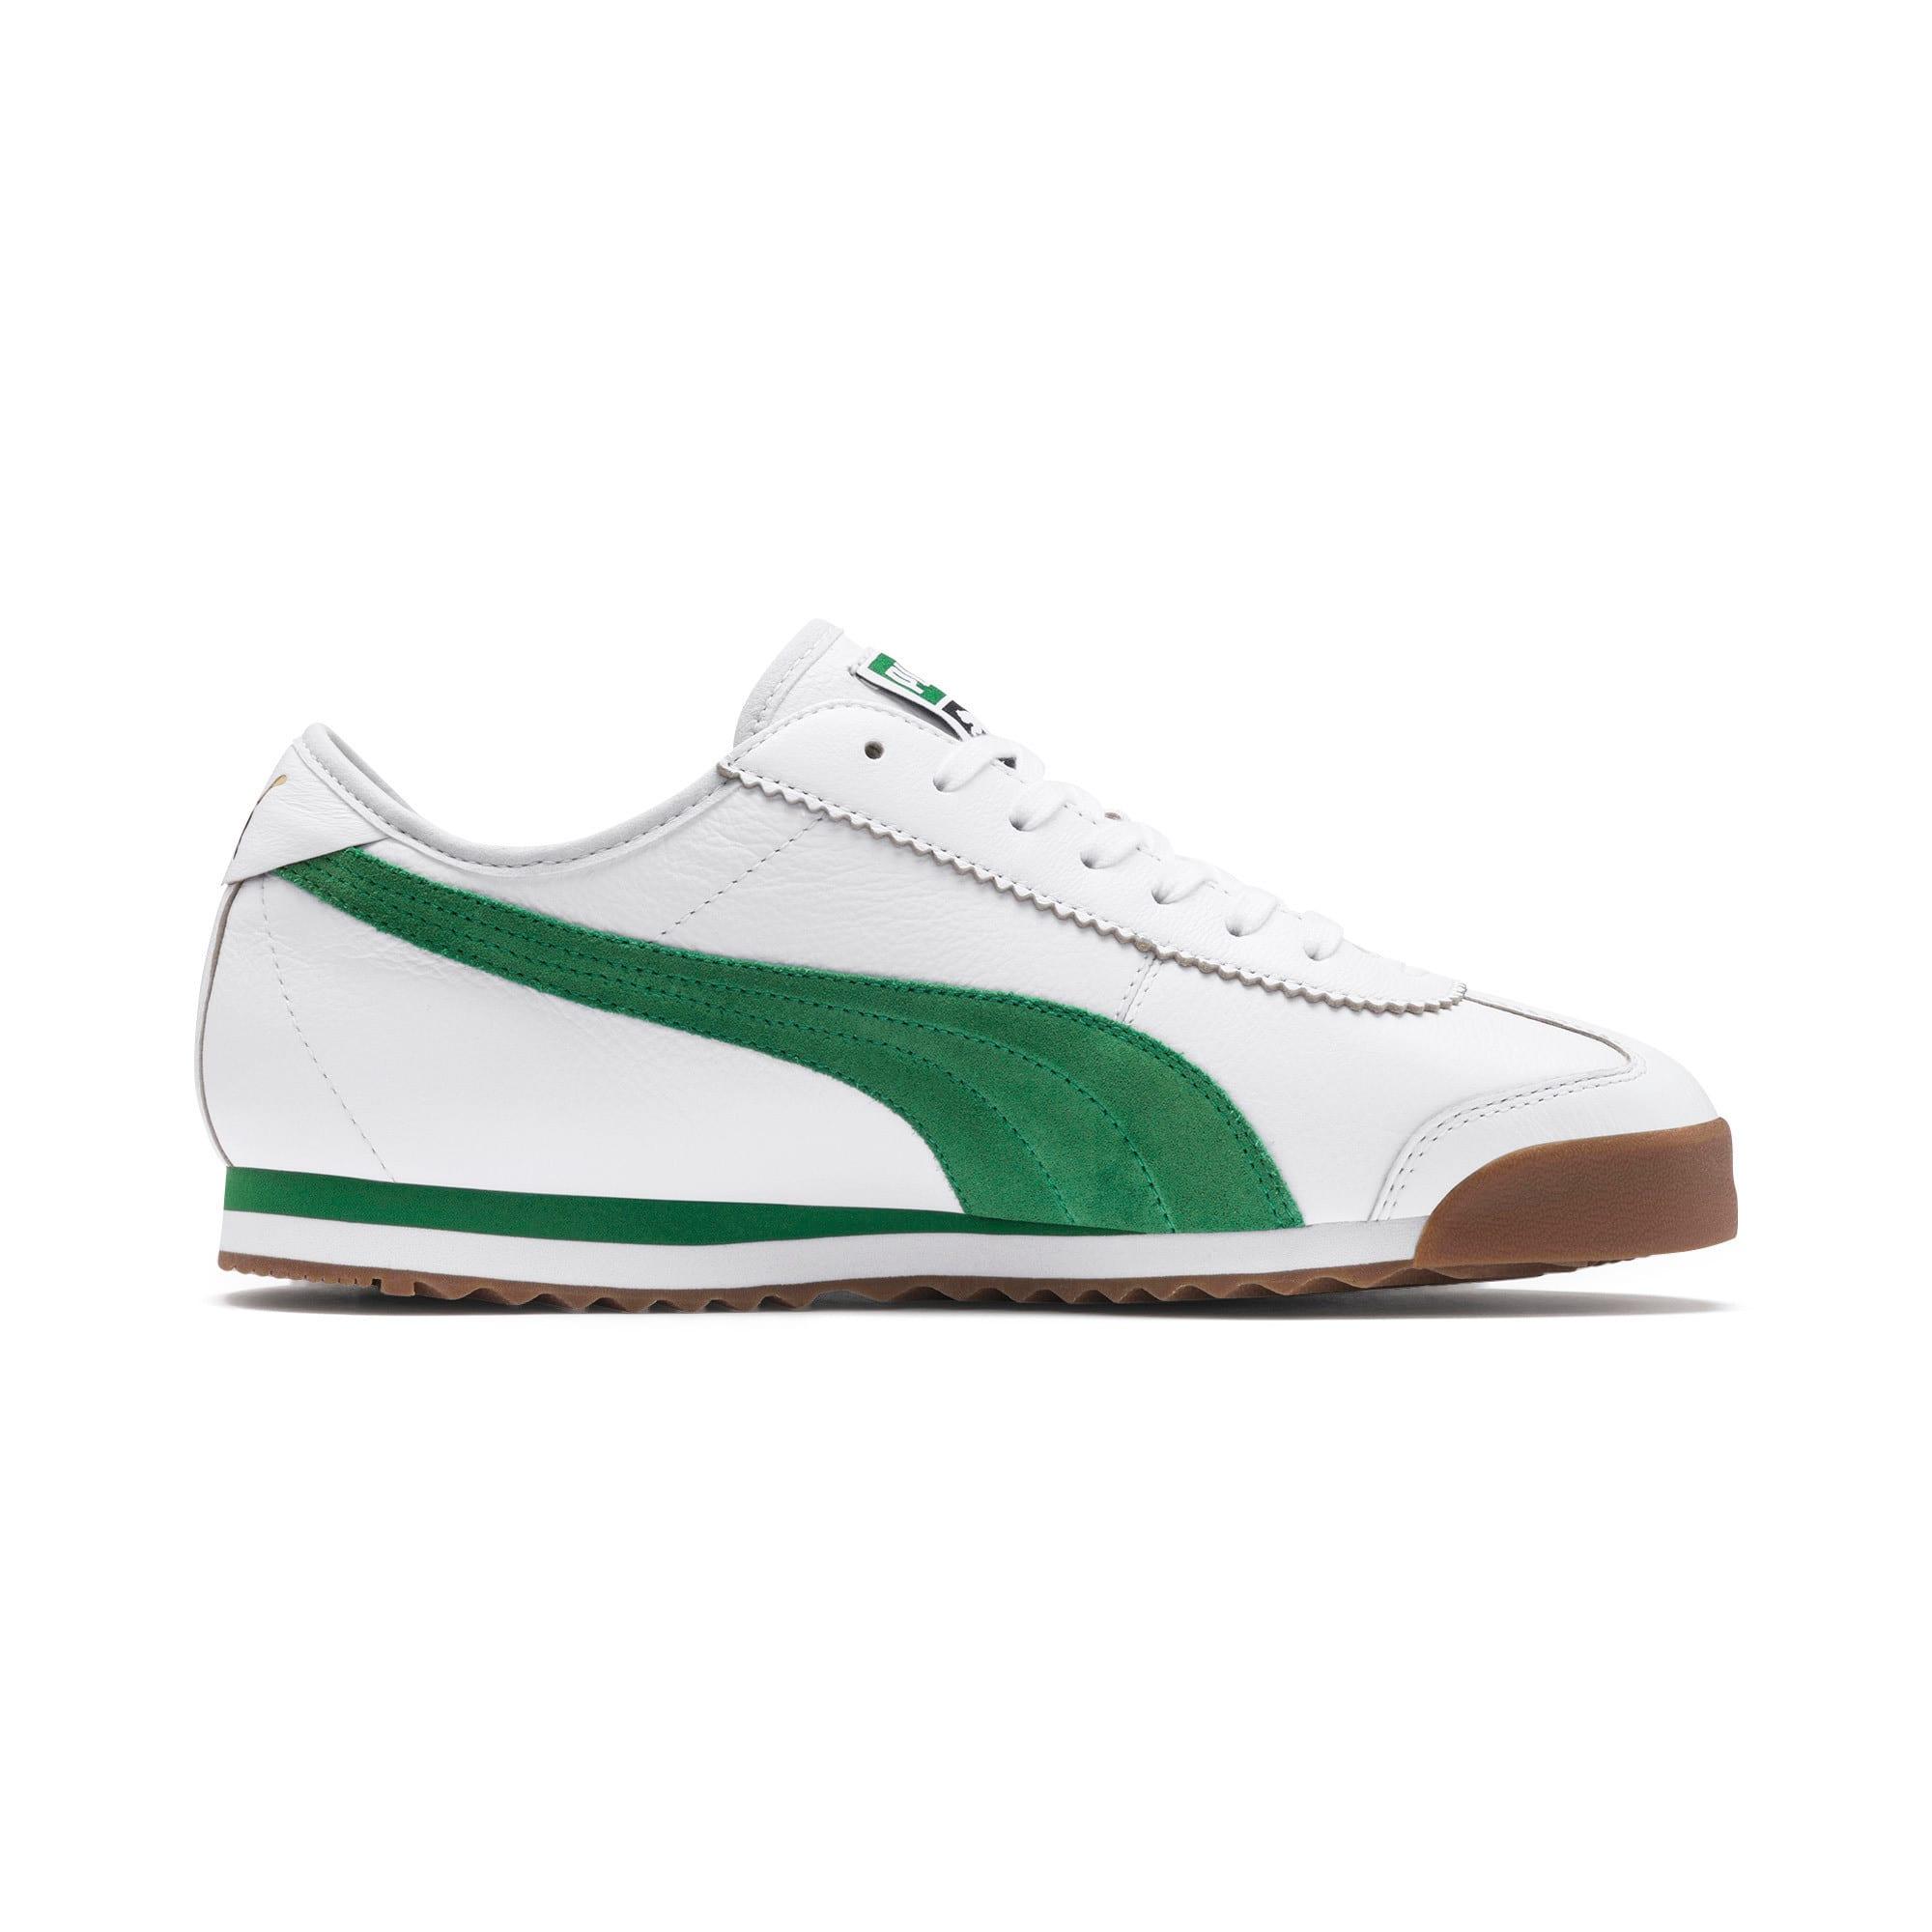 Thumbnail 6 of Roma '68 OG Sneakers, Puma White-Amazon Green, medium